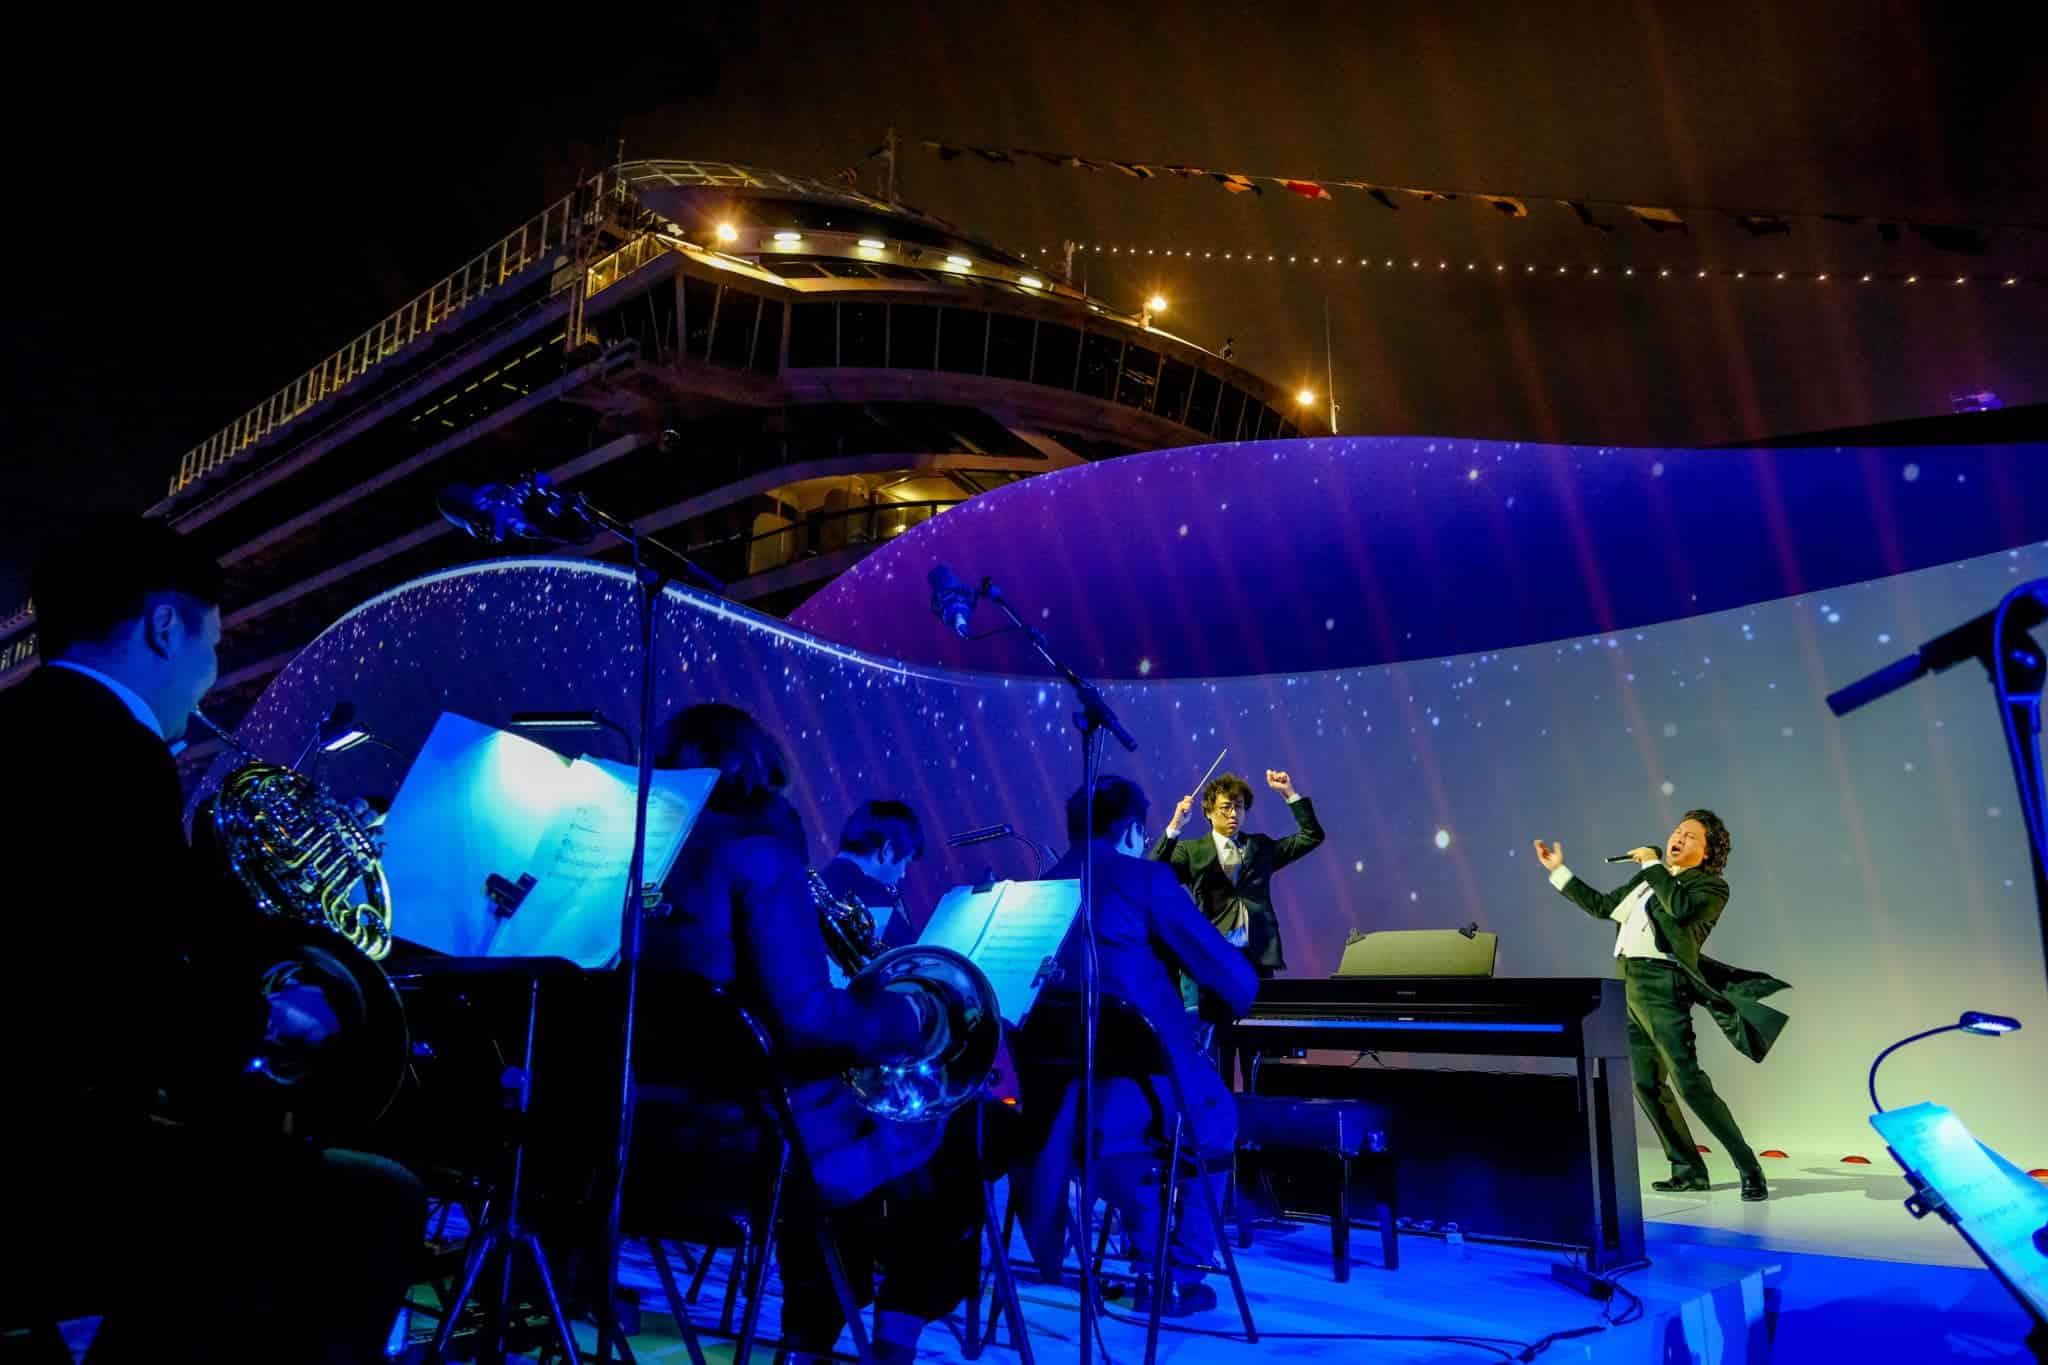 Viking Sun Vikings Fourth Ocean Ship Officially Named In Shanghai